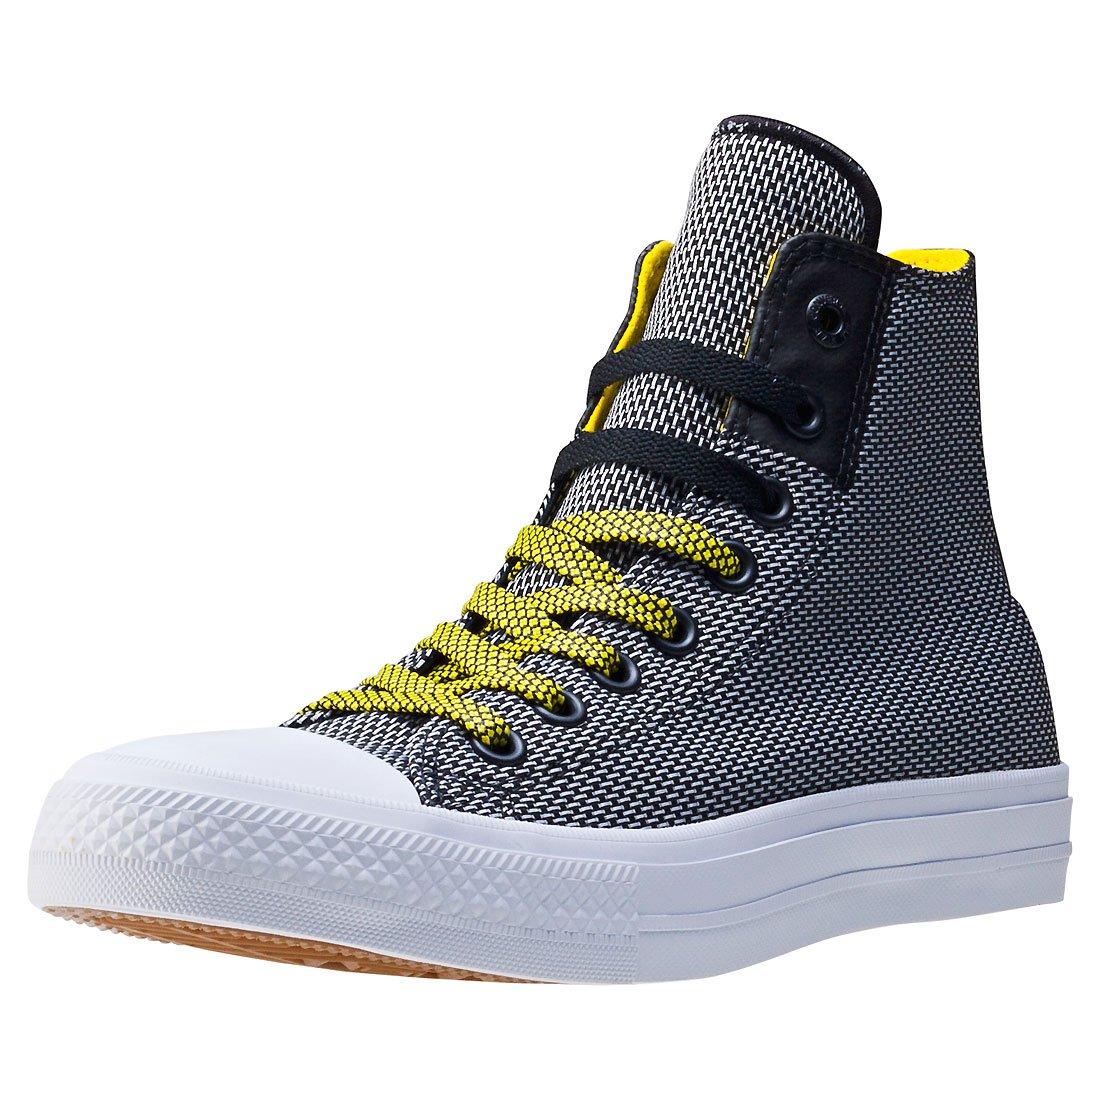 Converse Ctas Ii Hi Basket Weave Mens Trainers B01HNB7I9O 9.5 D(M) US|Black/White/Yellow